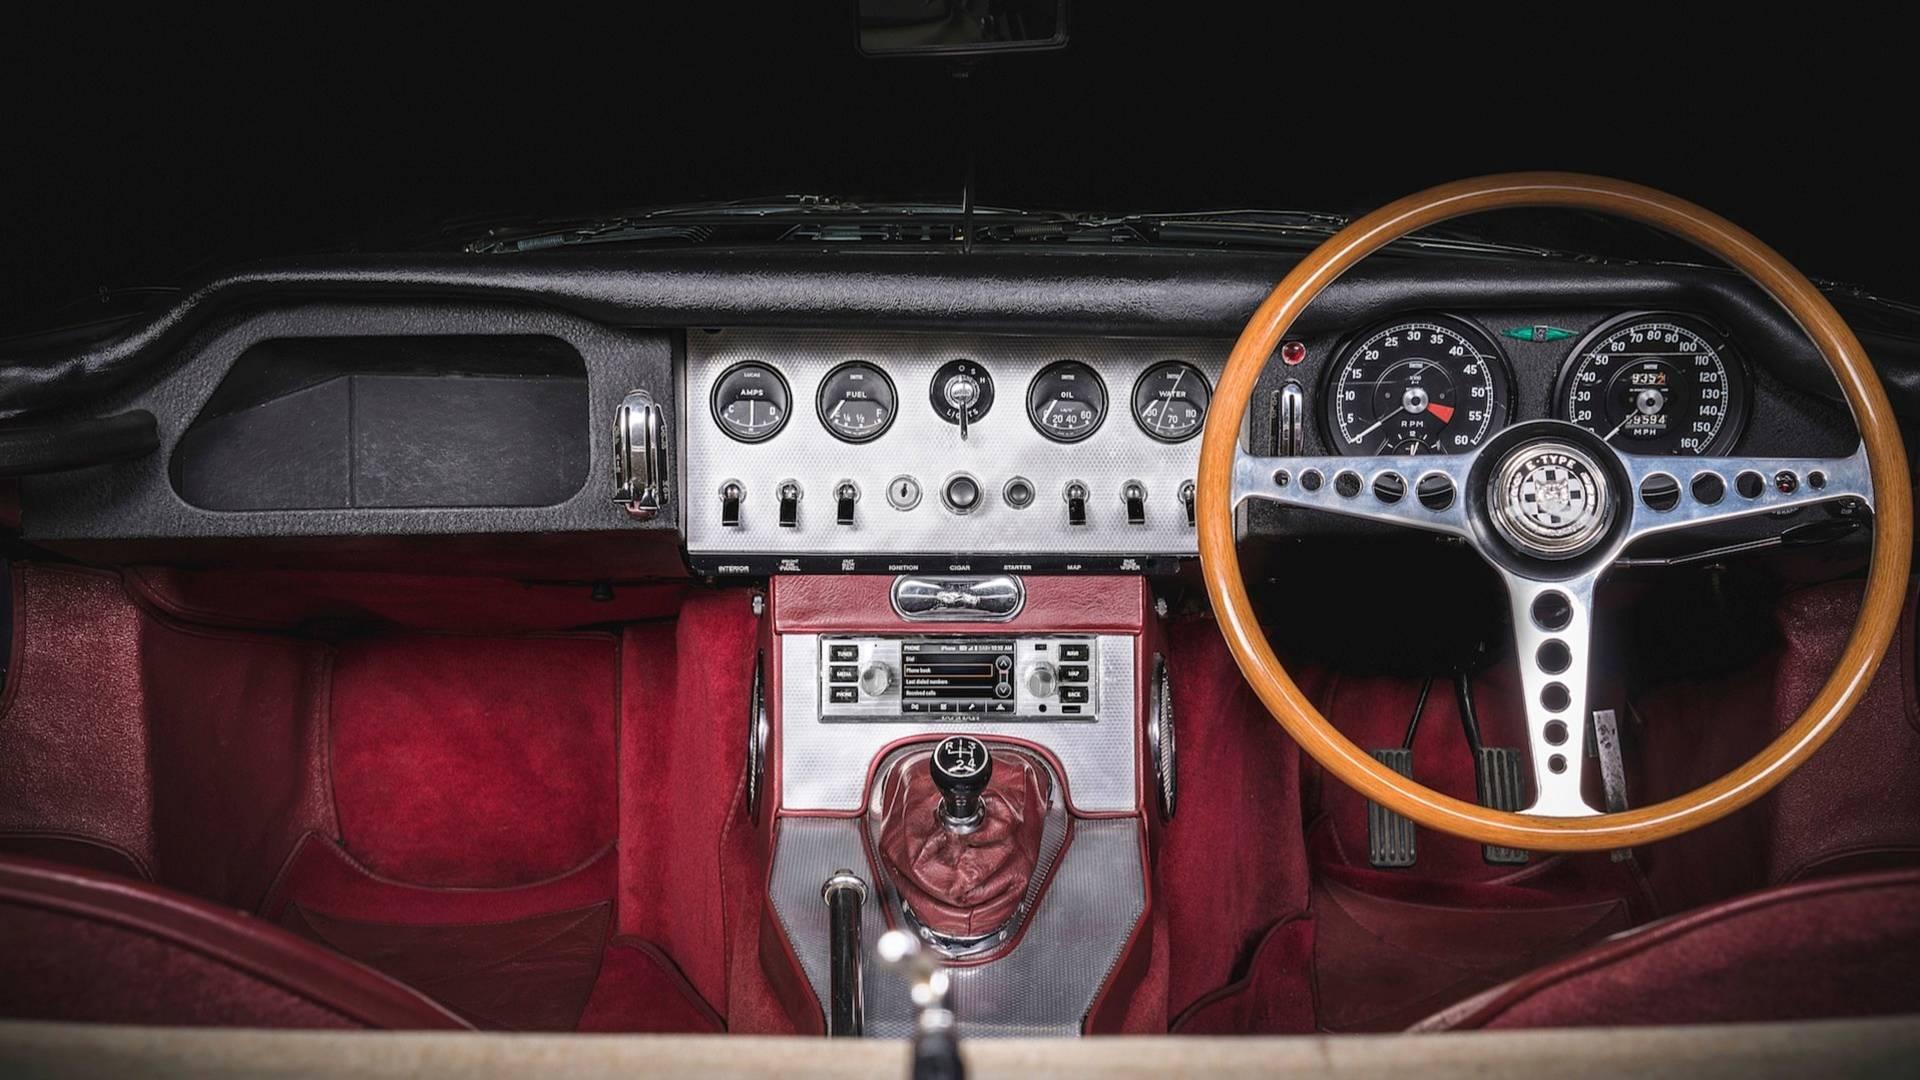 jaguar-land-rover-classic-infotainment-system (1)